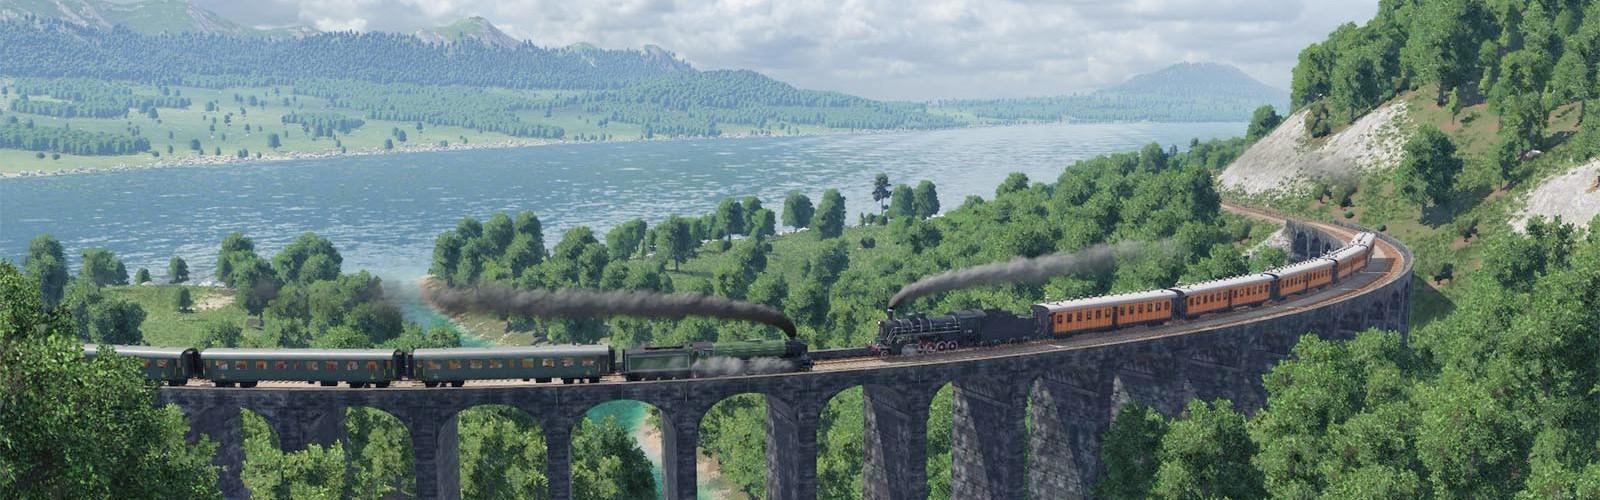 Transport Fever 2 Steam Key GLOBAL